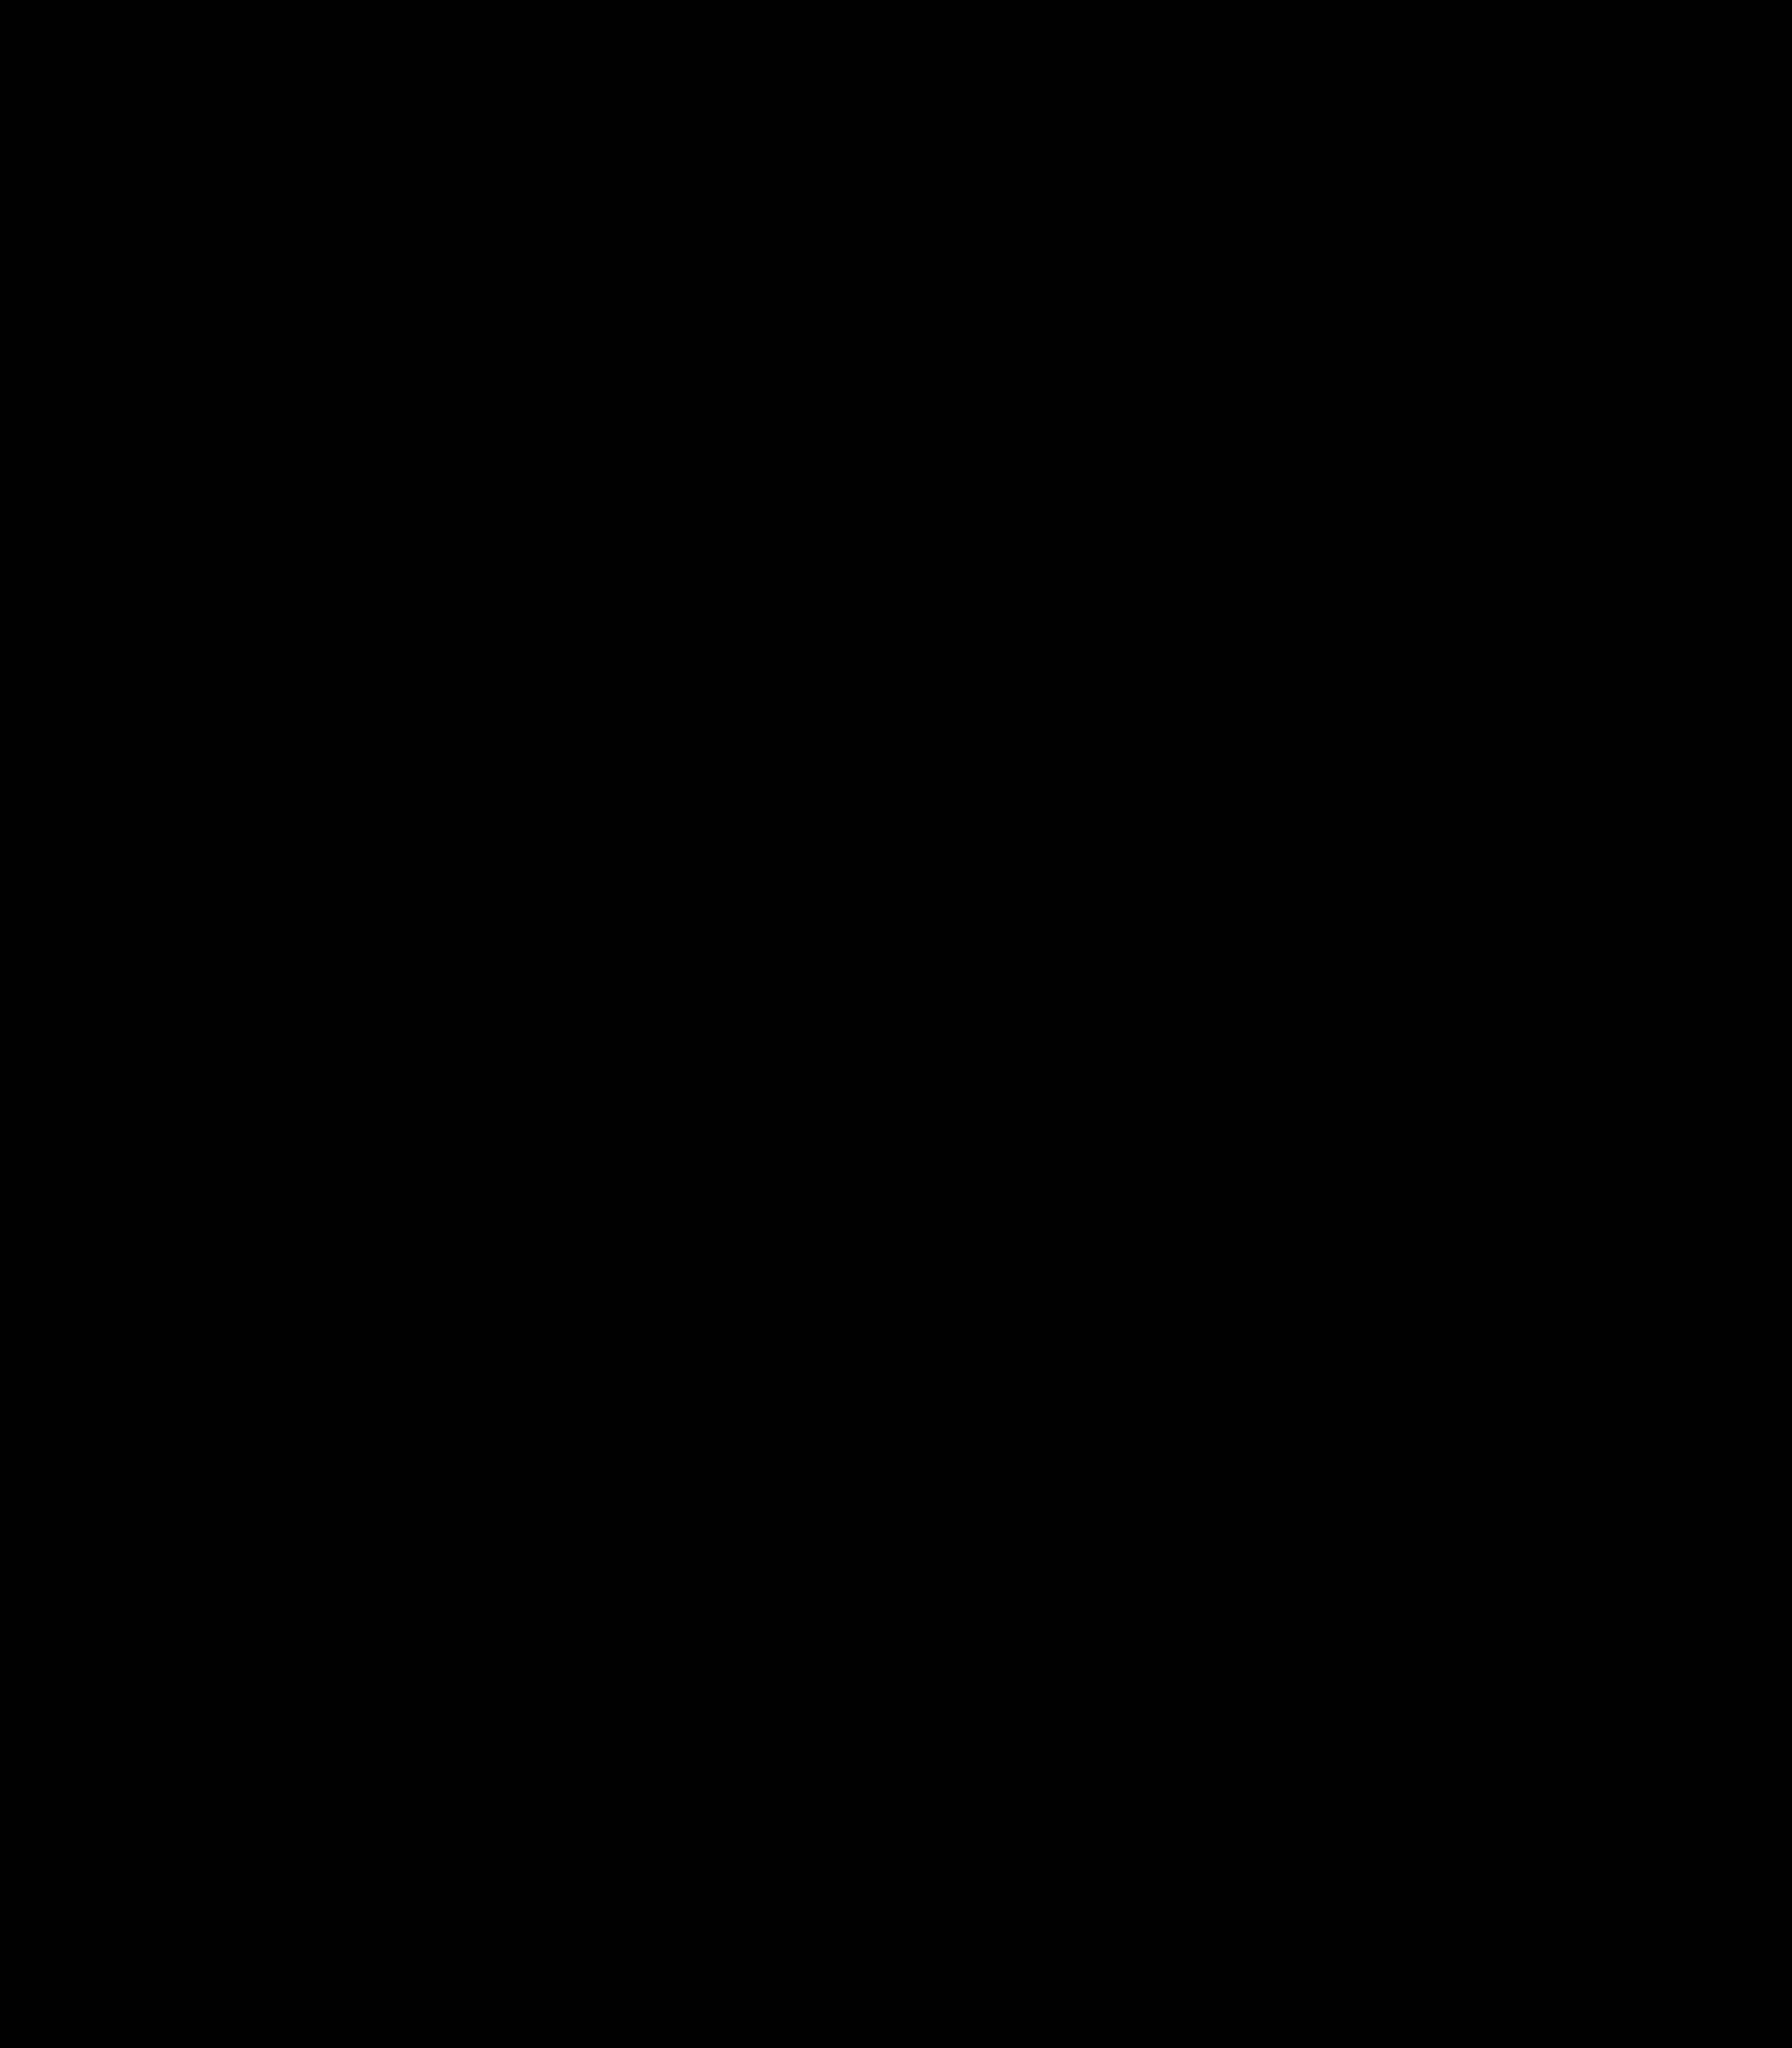 2000px Octicons Terminal Svg Png 2000 2286 Letters Symbols